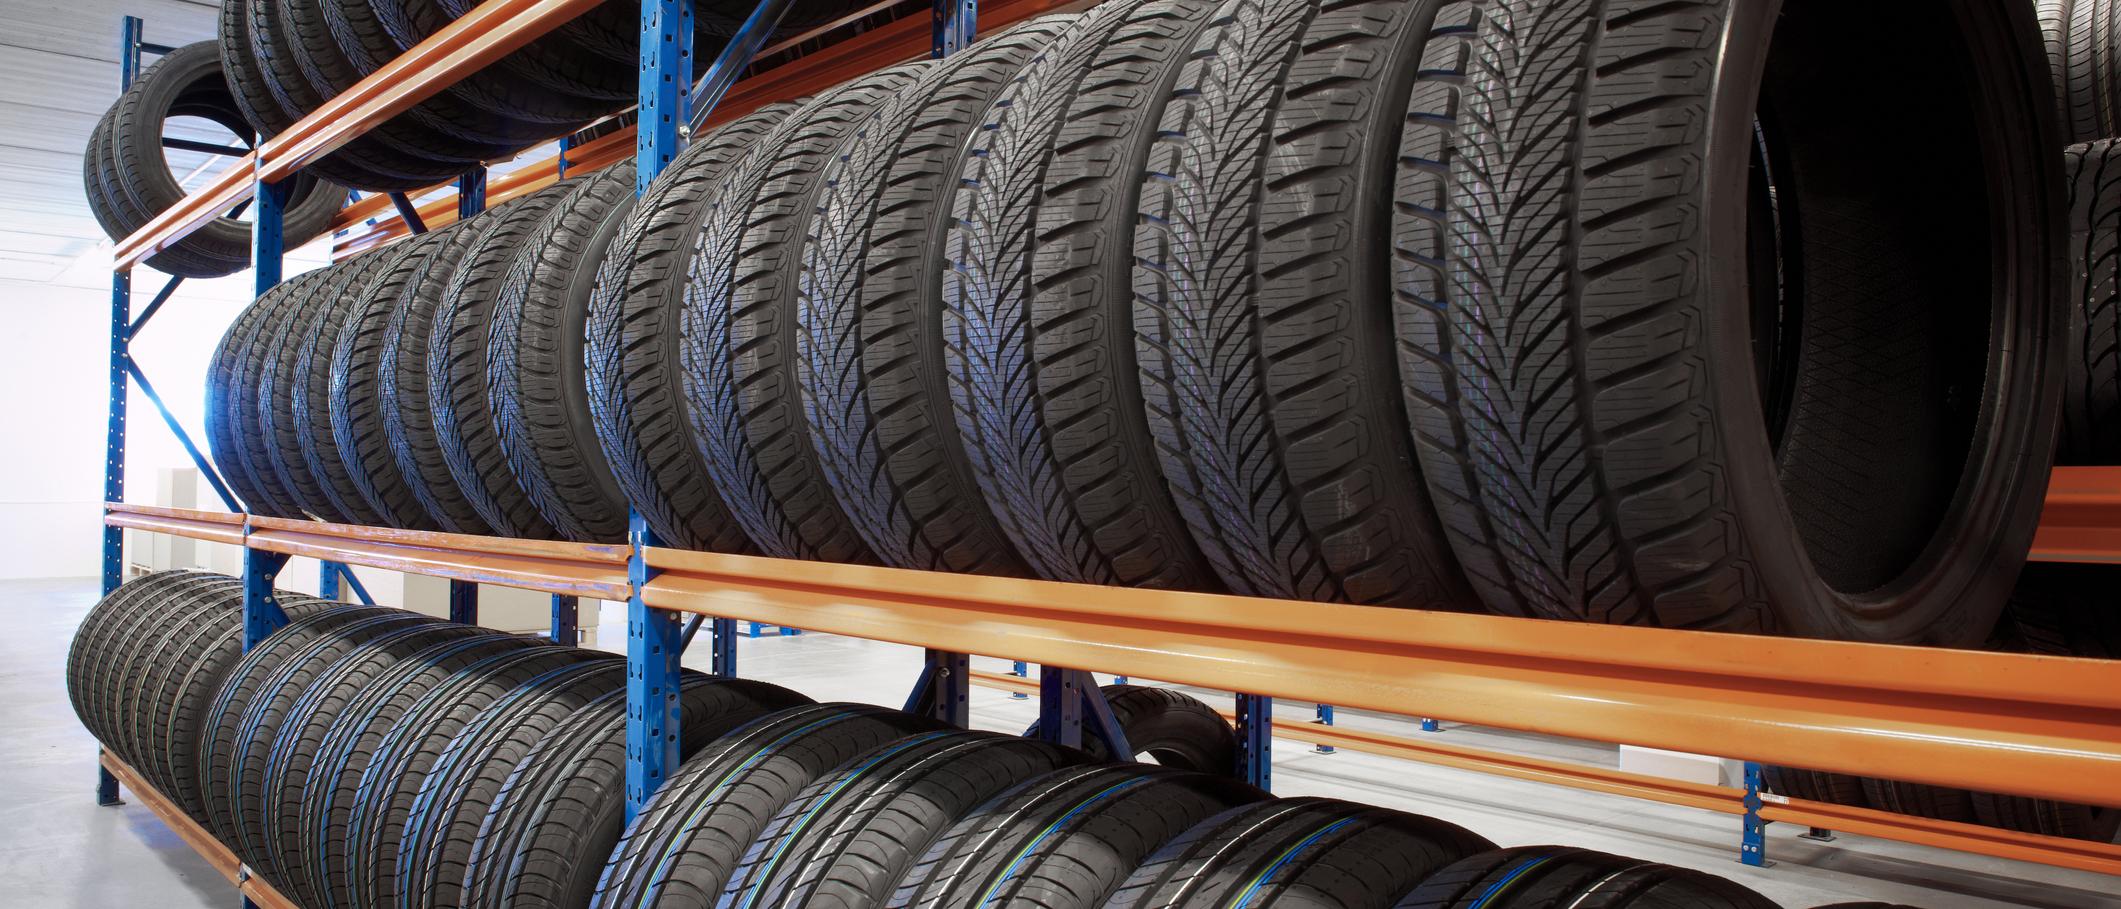 Black tires stored on shelf in warehouse